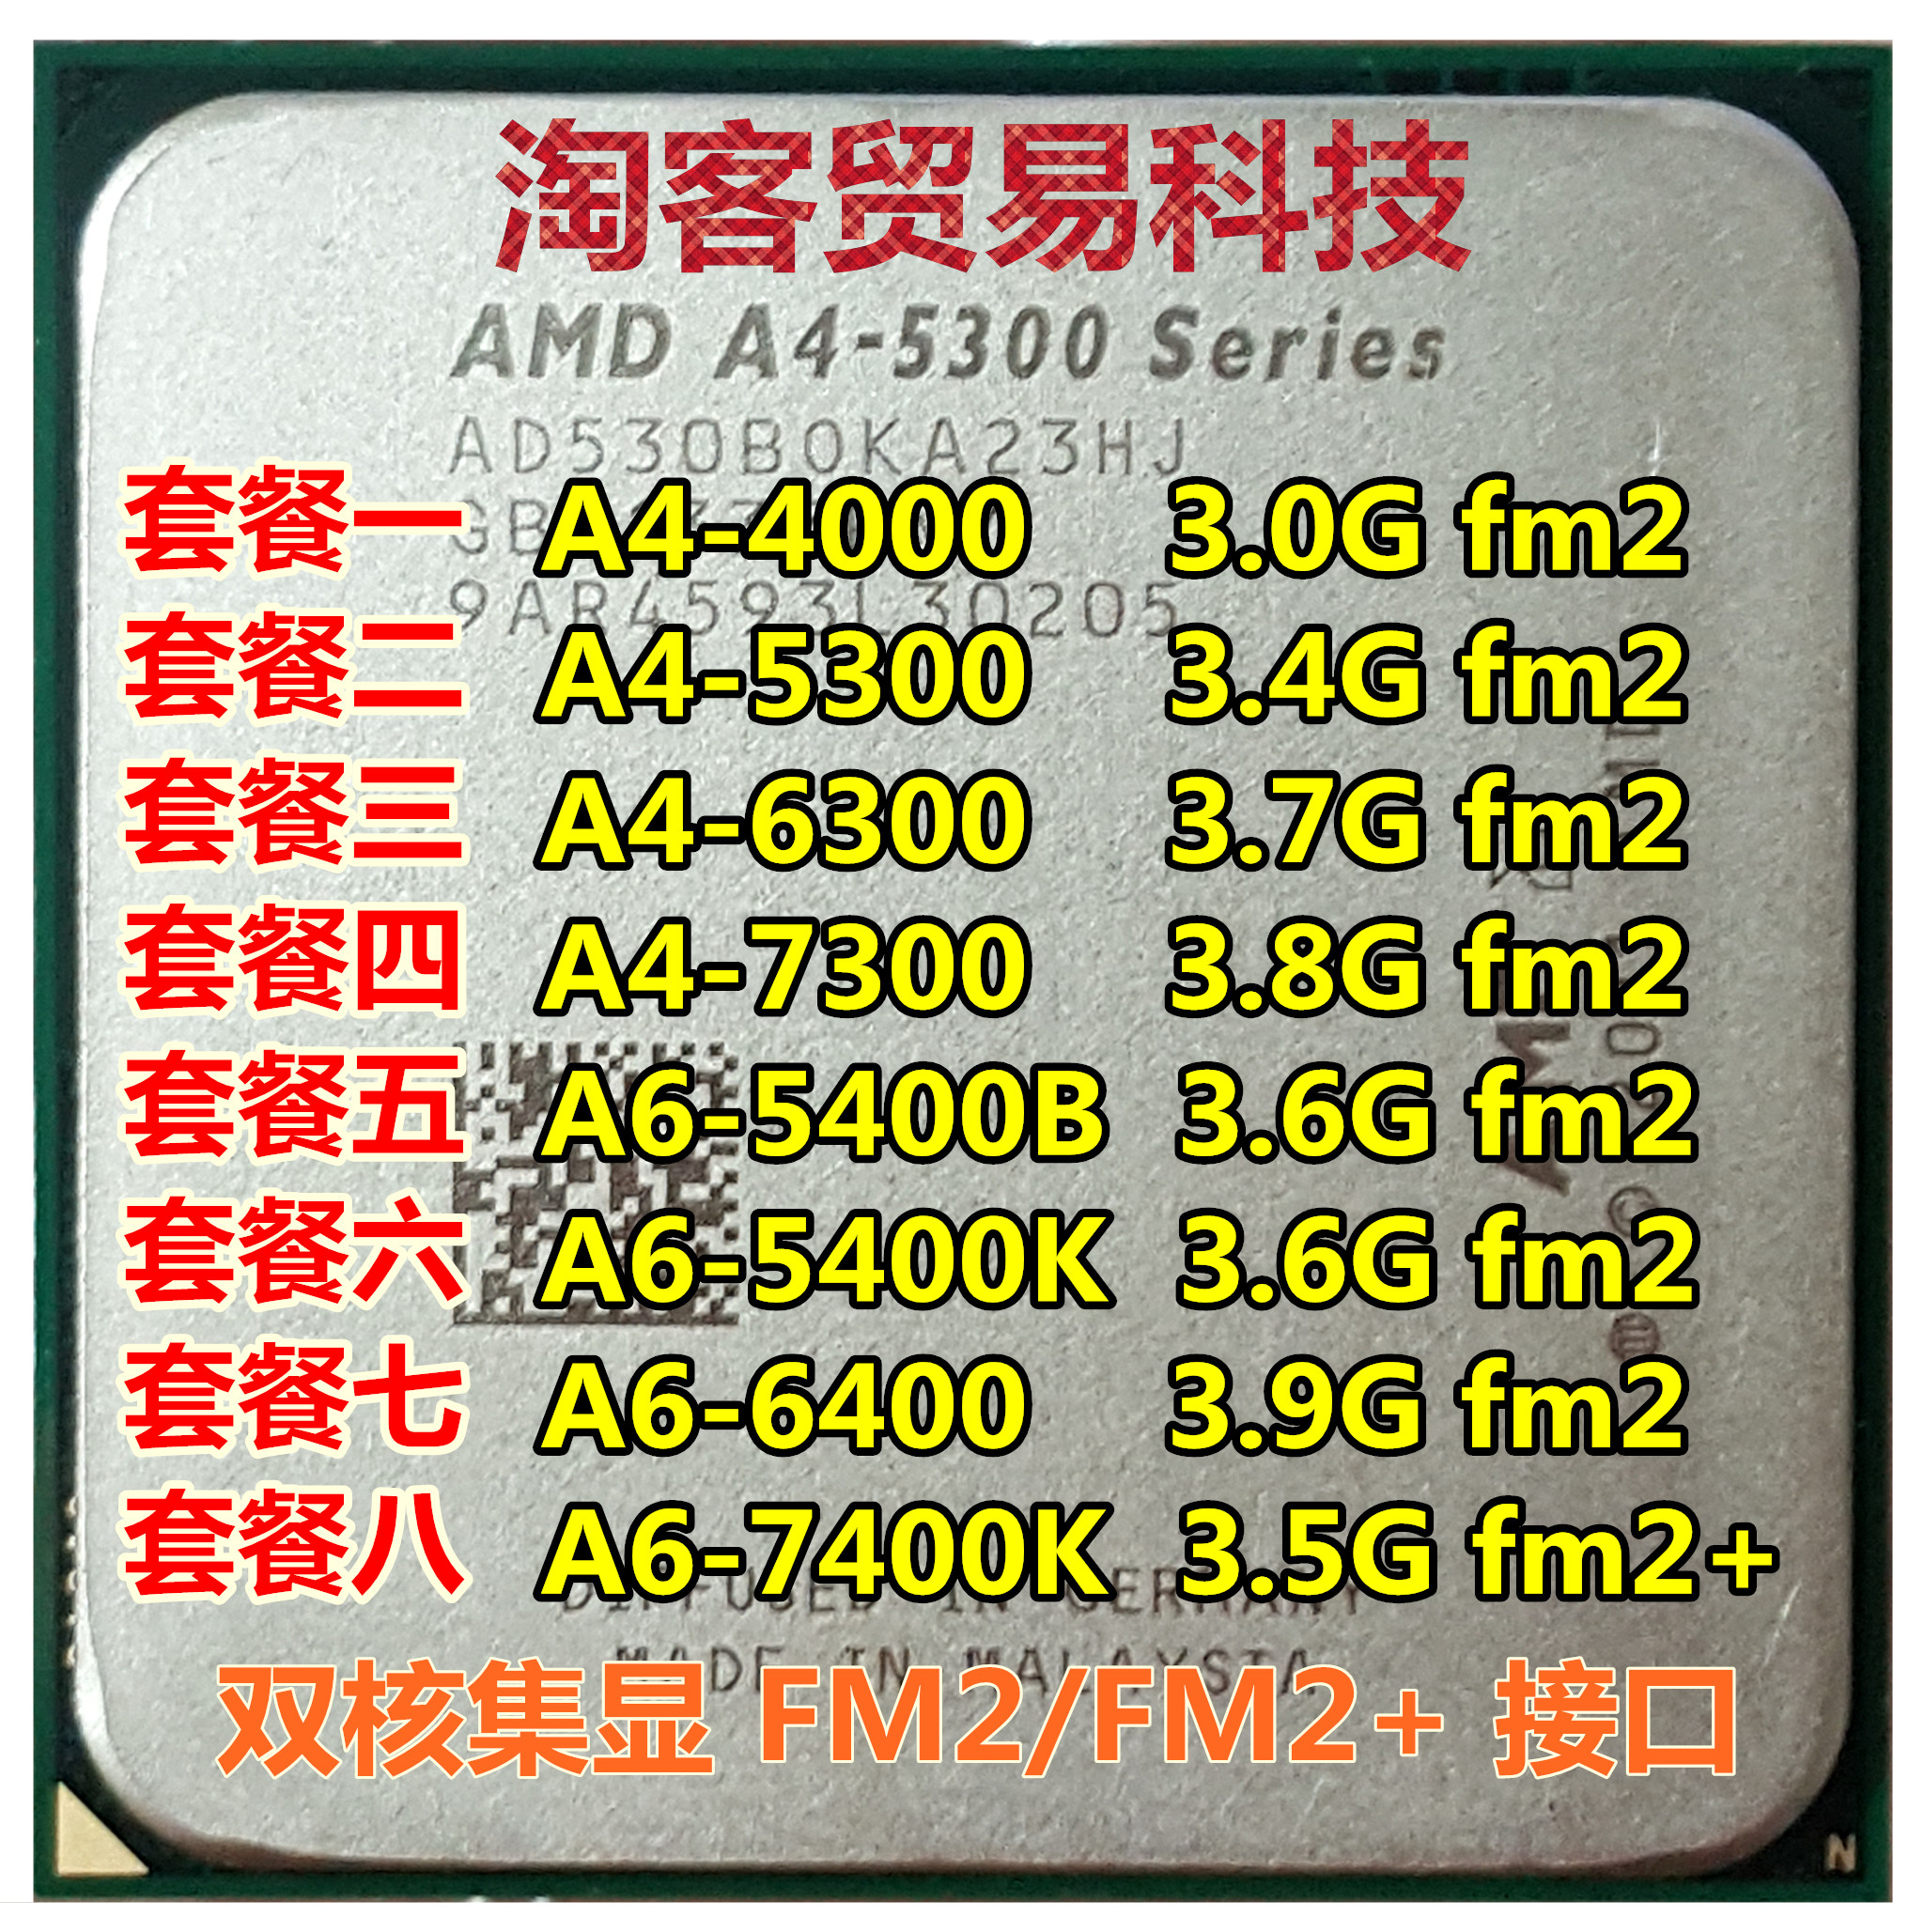 AMD A4 5300 4000 6300 A6-5400K CPU 双核 FM2 905针 集显 散片